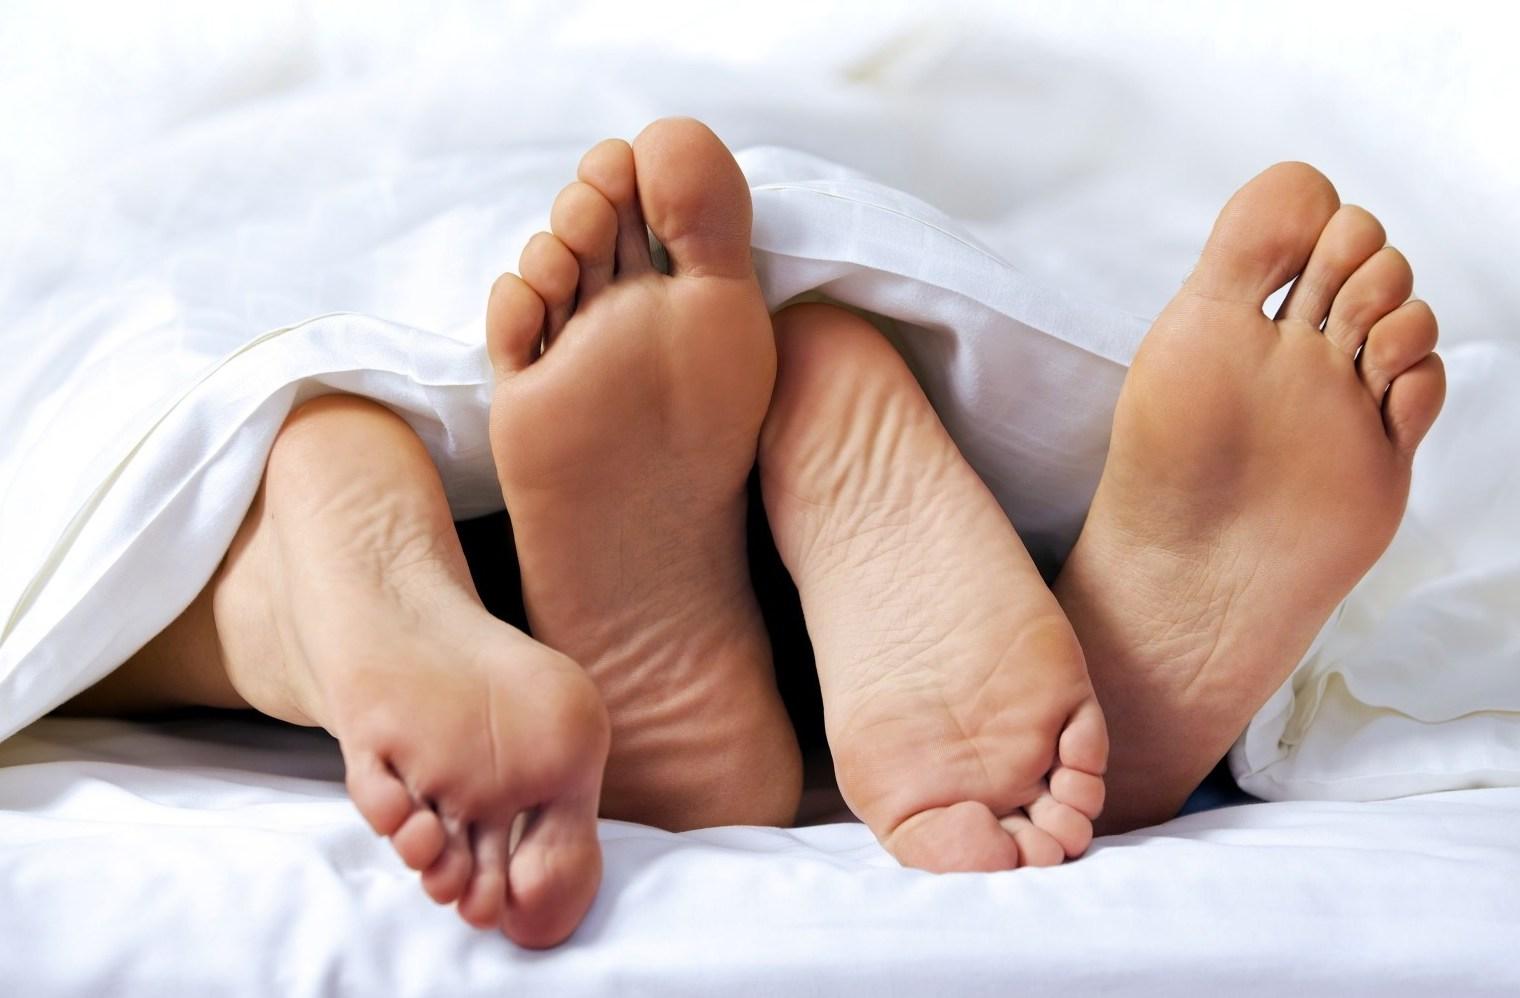 30225d9e9 أطباء يكشفون عن 10 فوائد صحية لممارسة الجنس – Jasmine Elnadeem